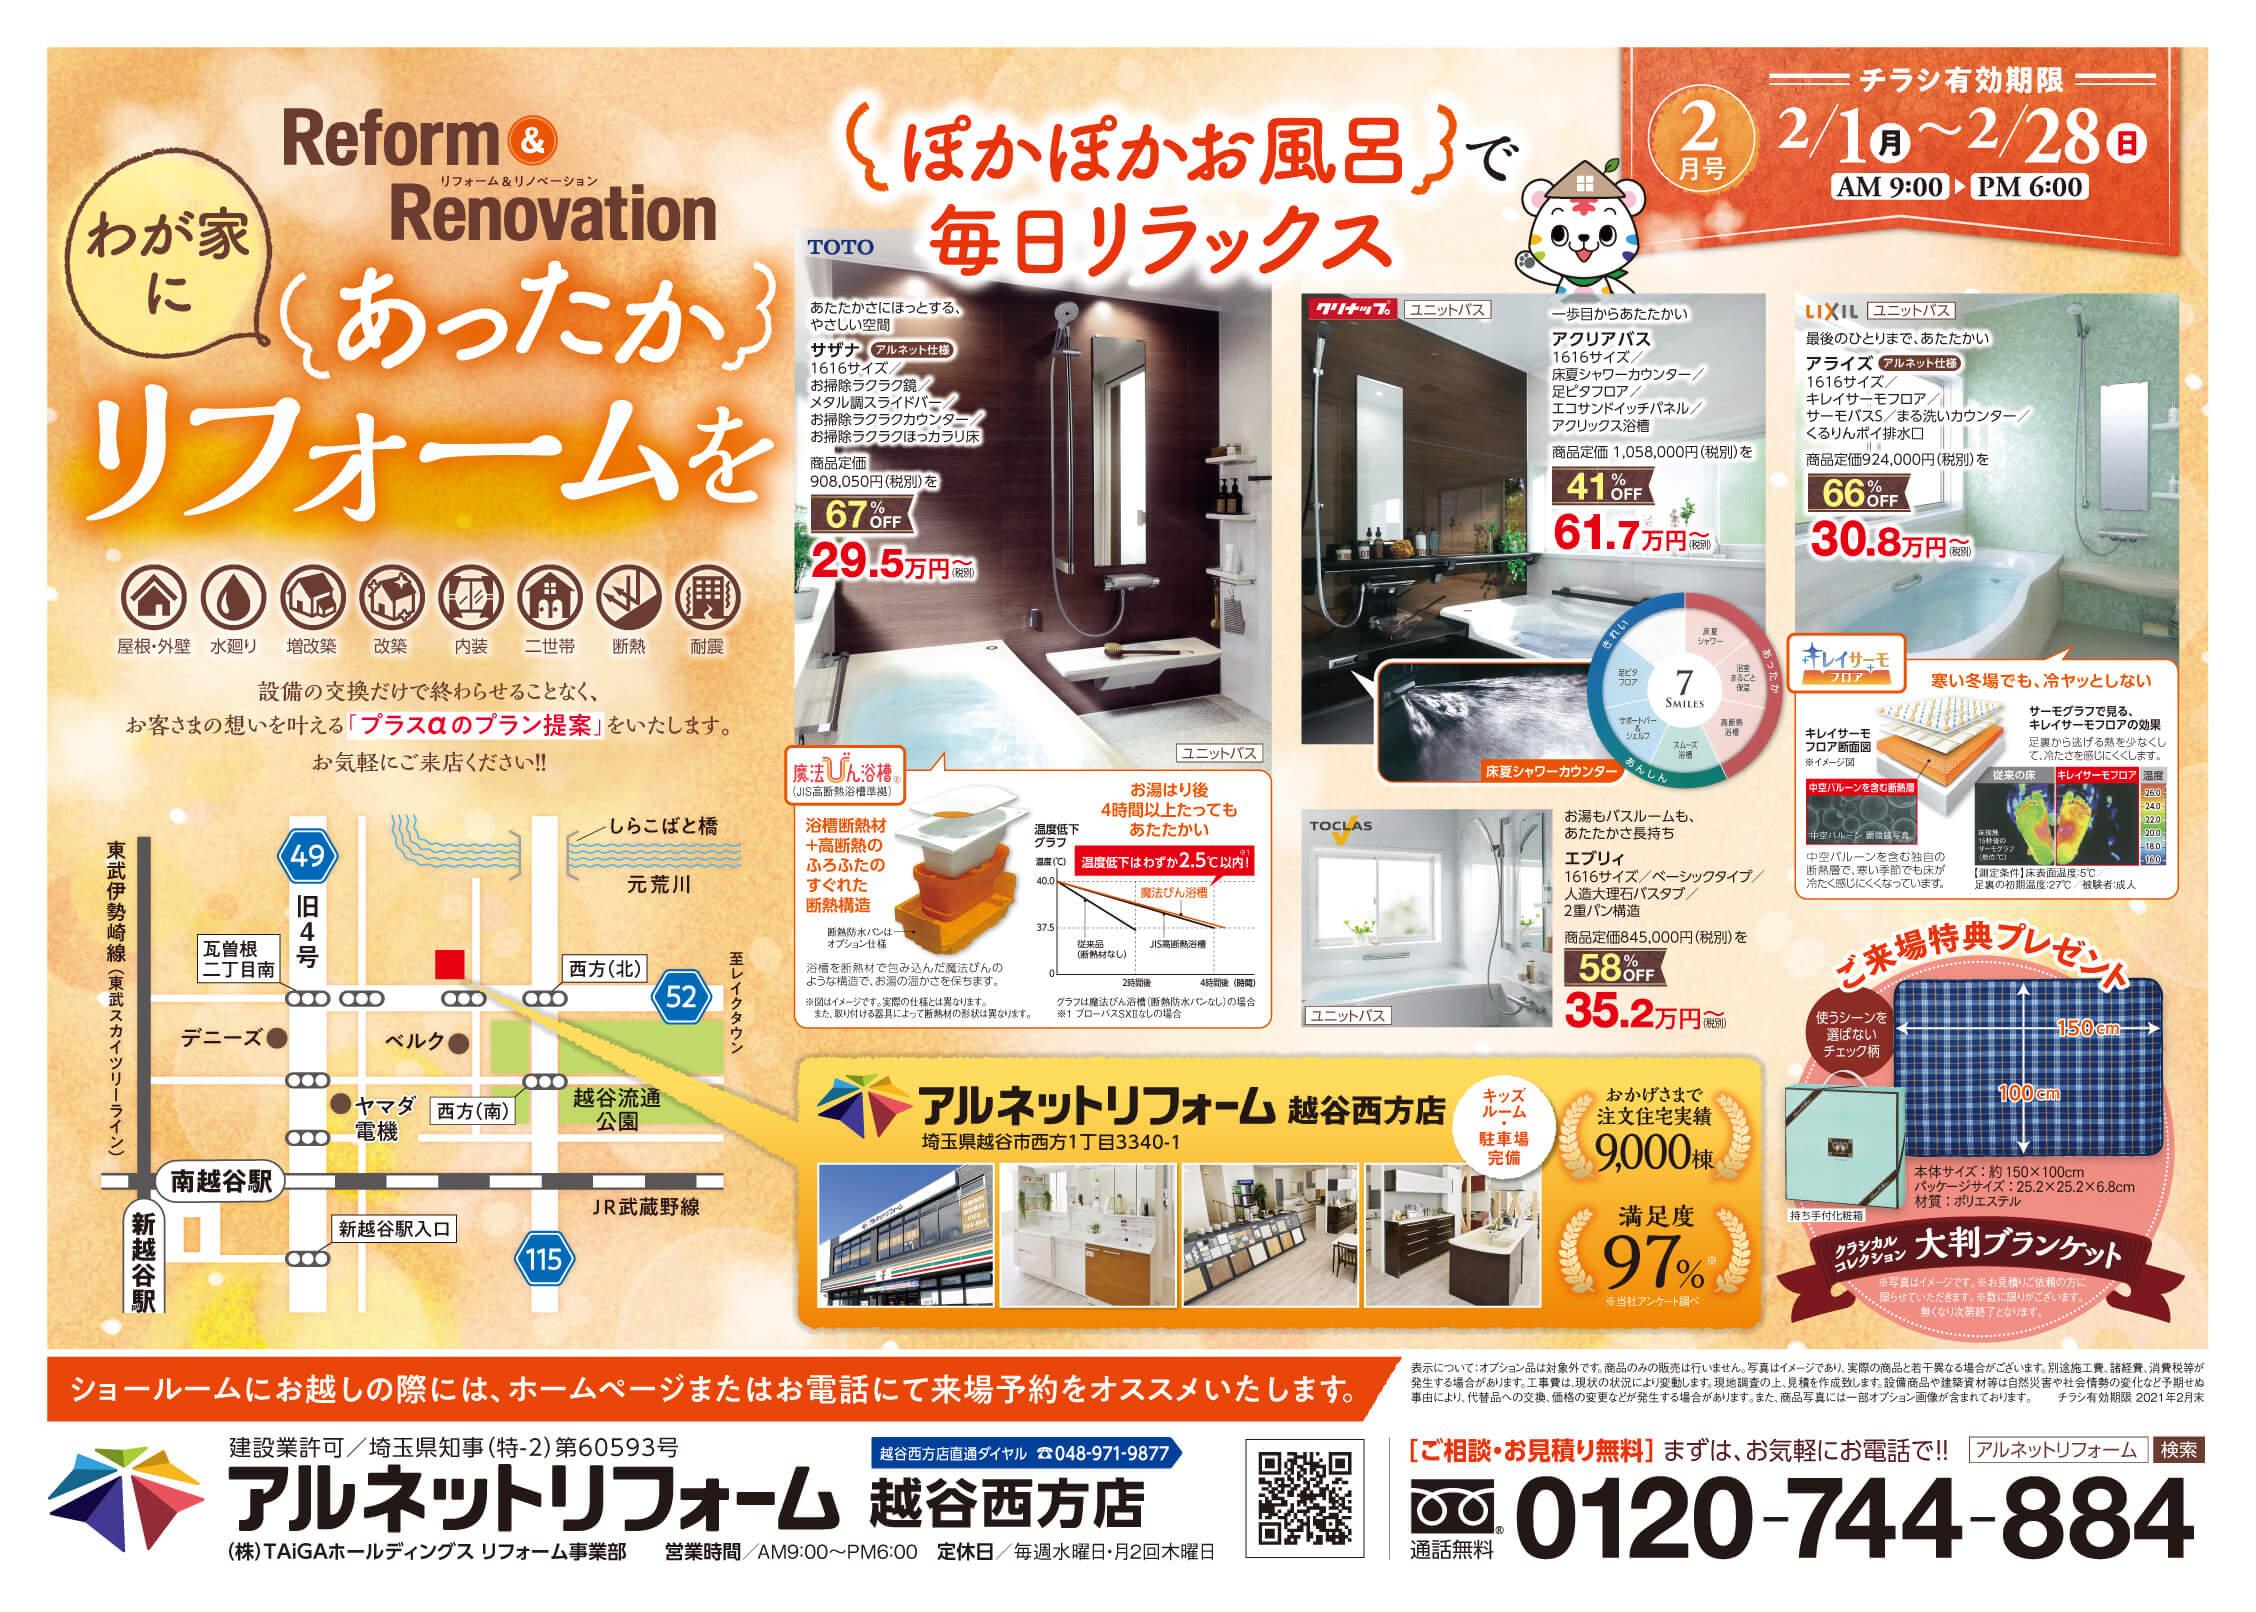 【岩槻本店&越谷西方店】2月イベント開催!